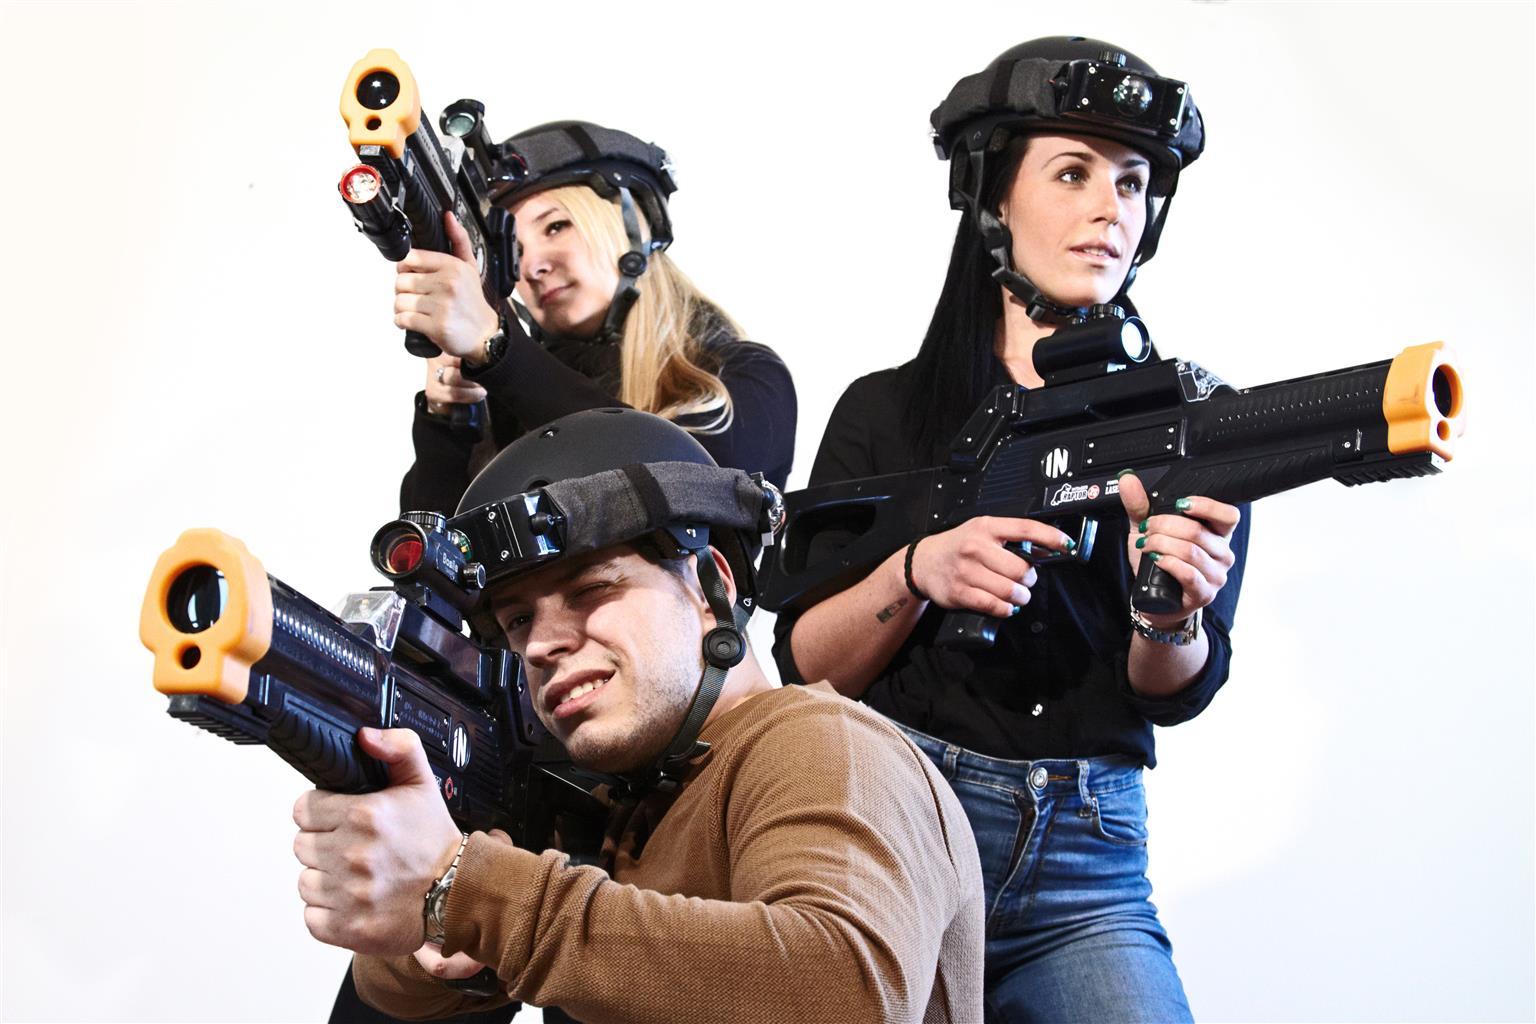 Laser Tag Equipment